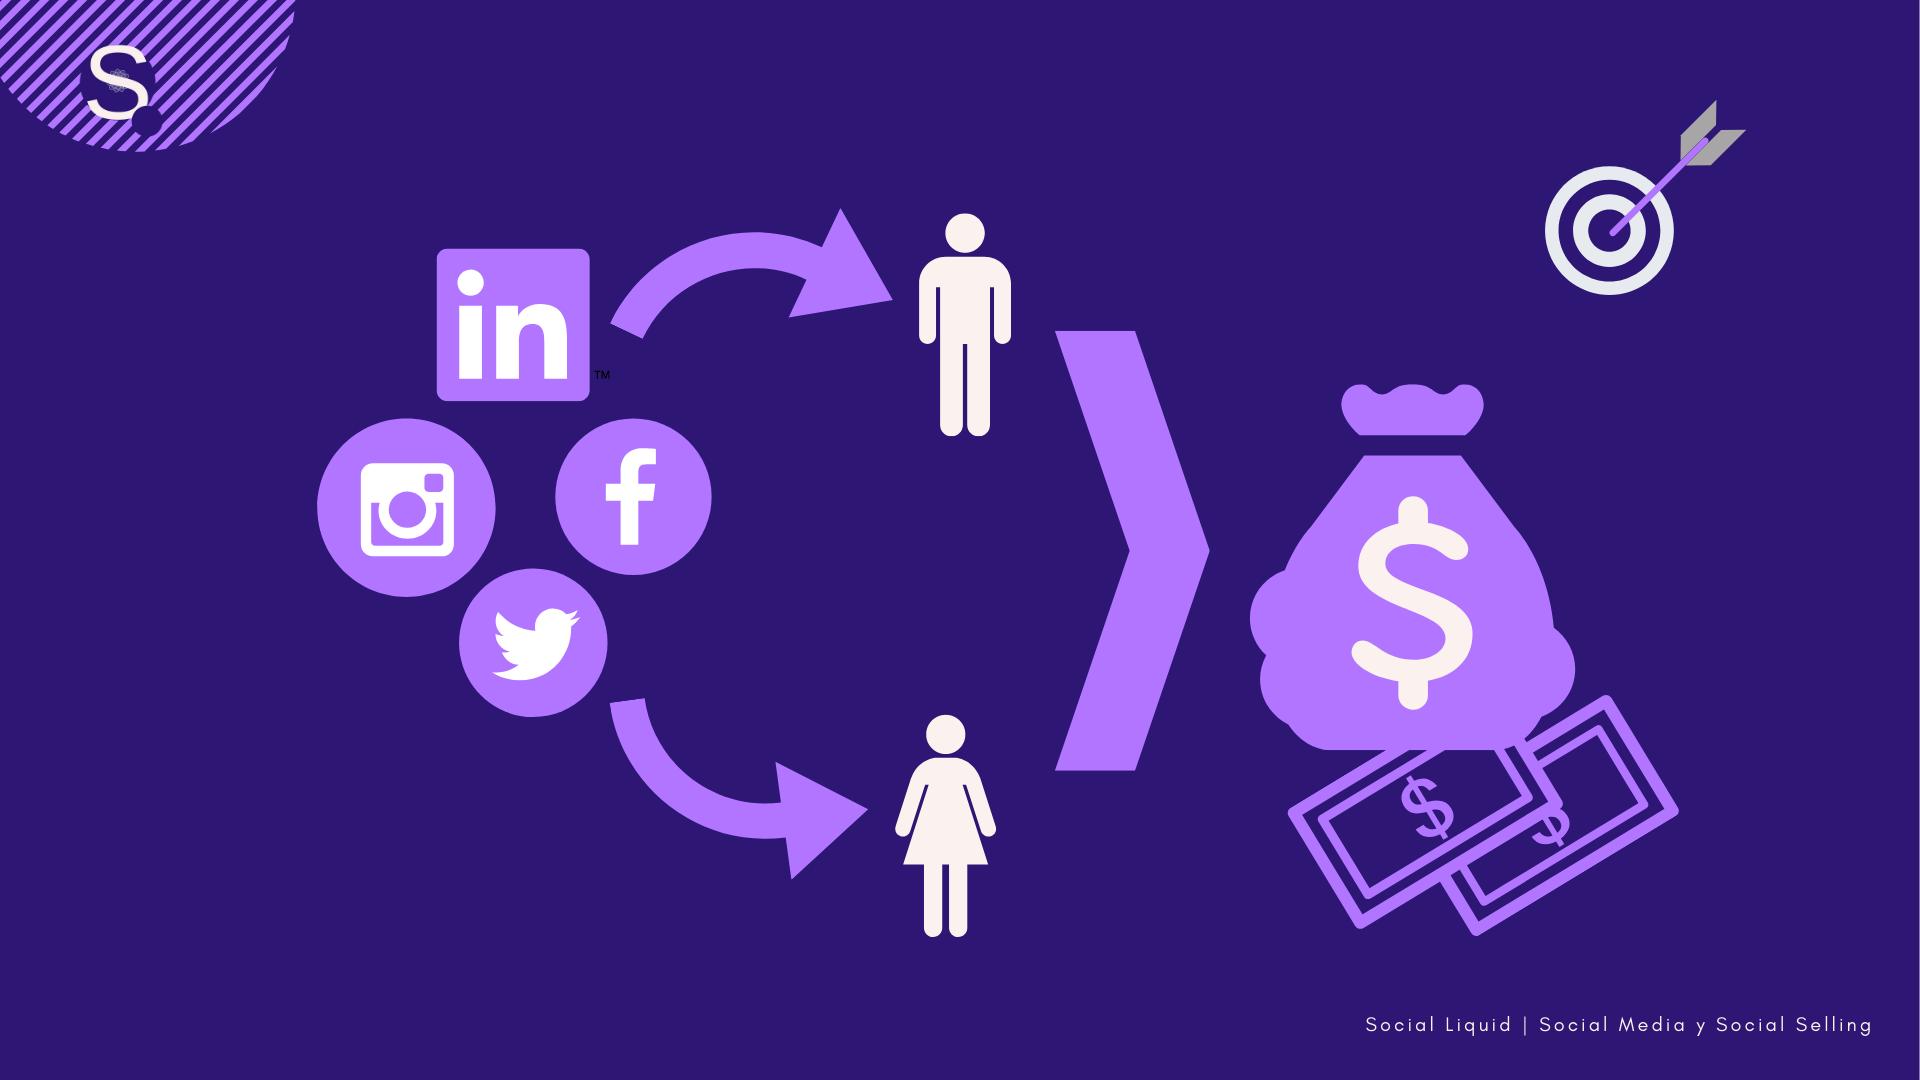 Social Media y Social Selling